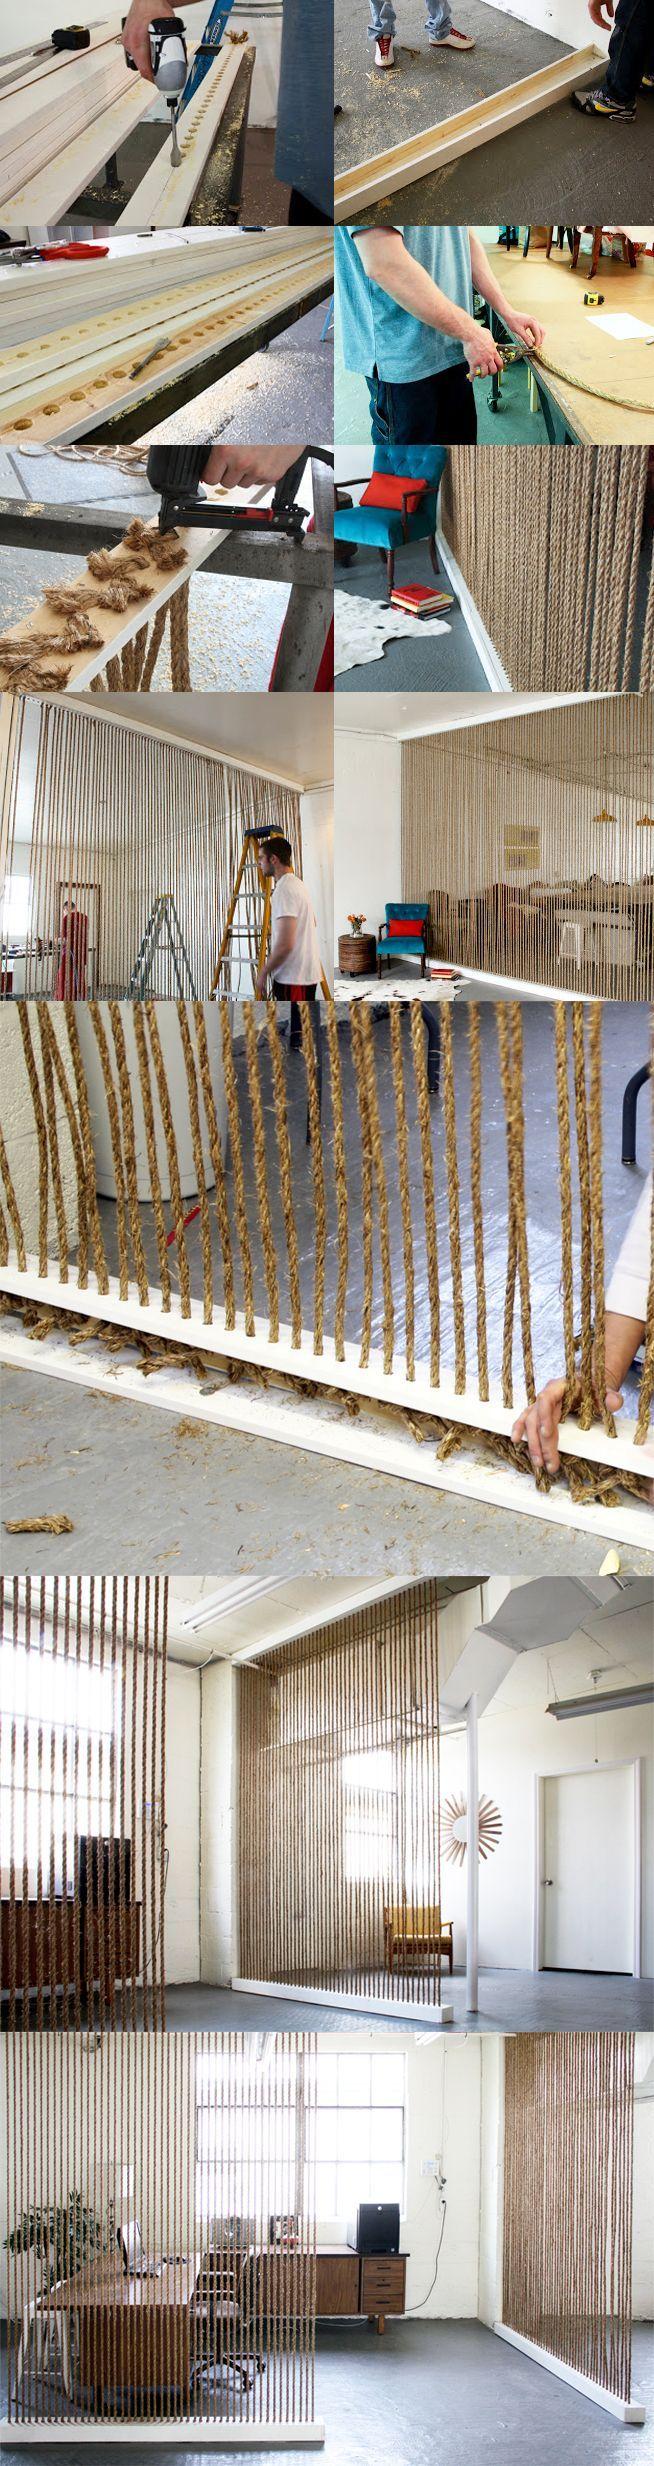 DECOR | Separando ambientes sem paredes | Dividing without walls